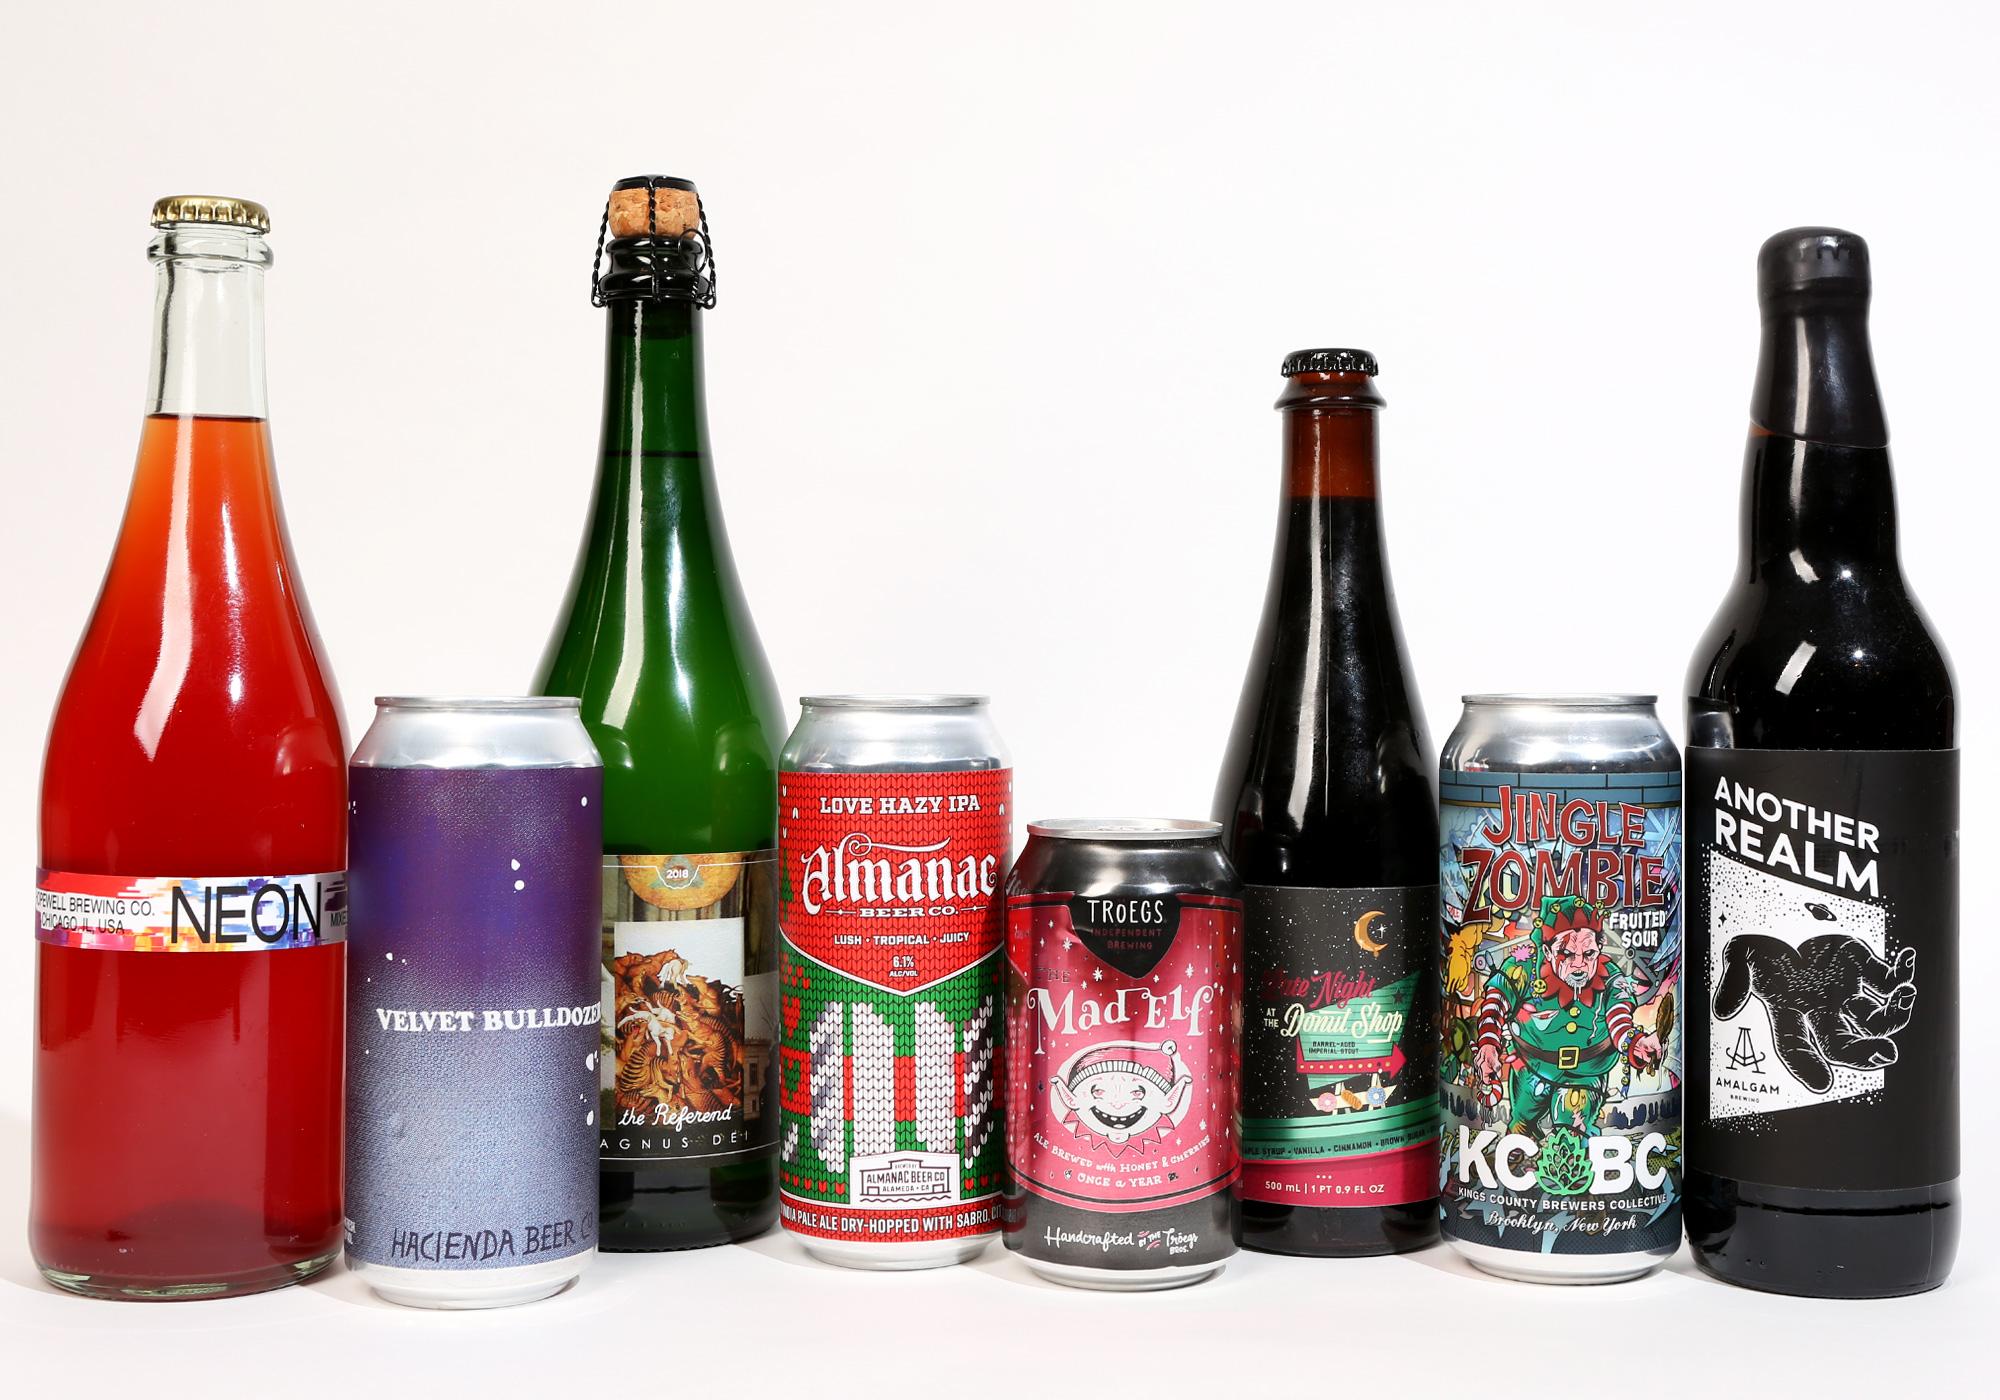 The 20 Best Beers to Drink in Winter 2020